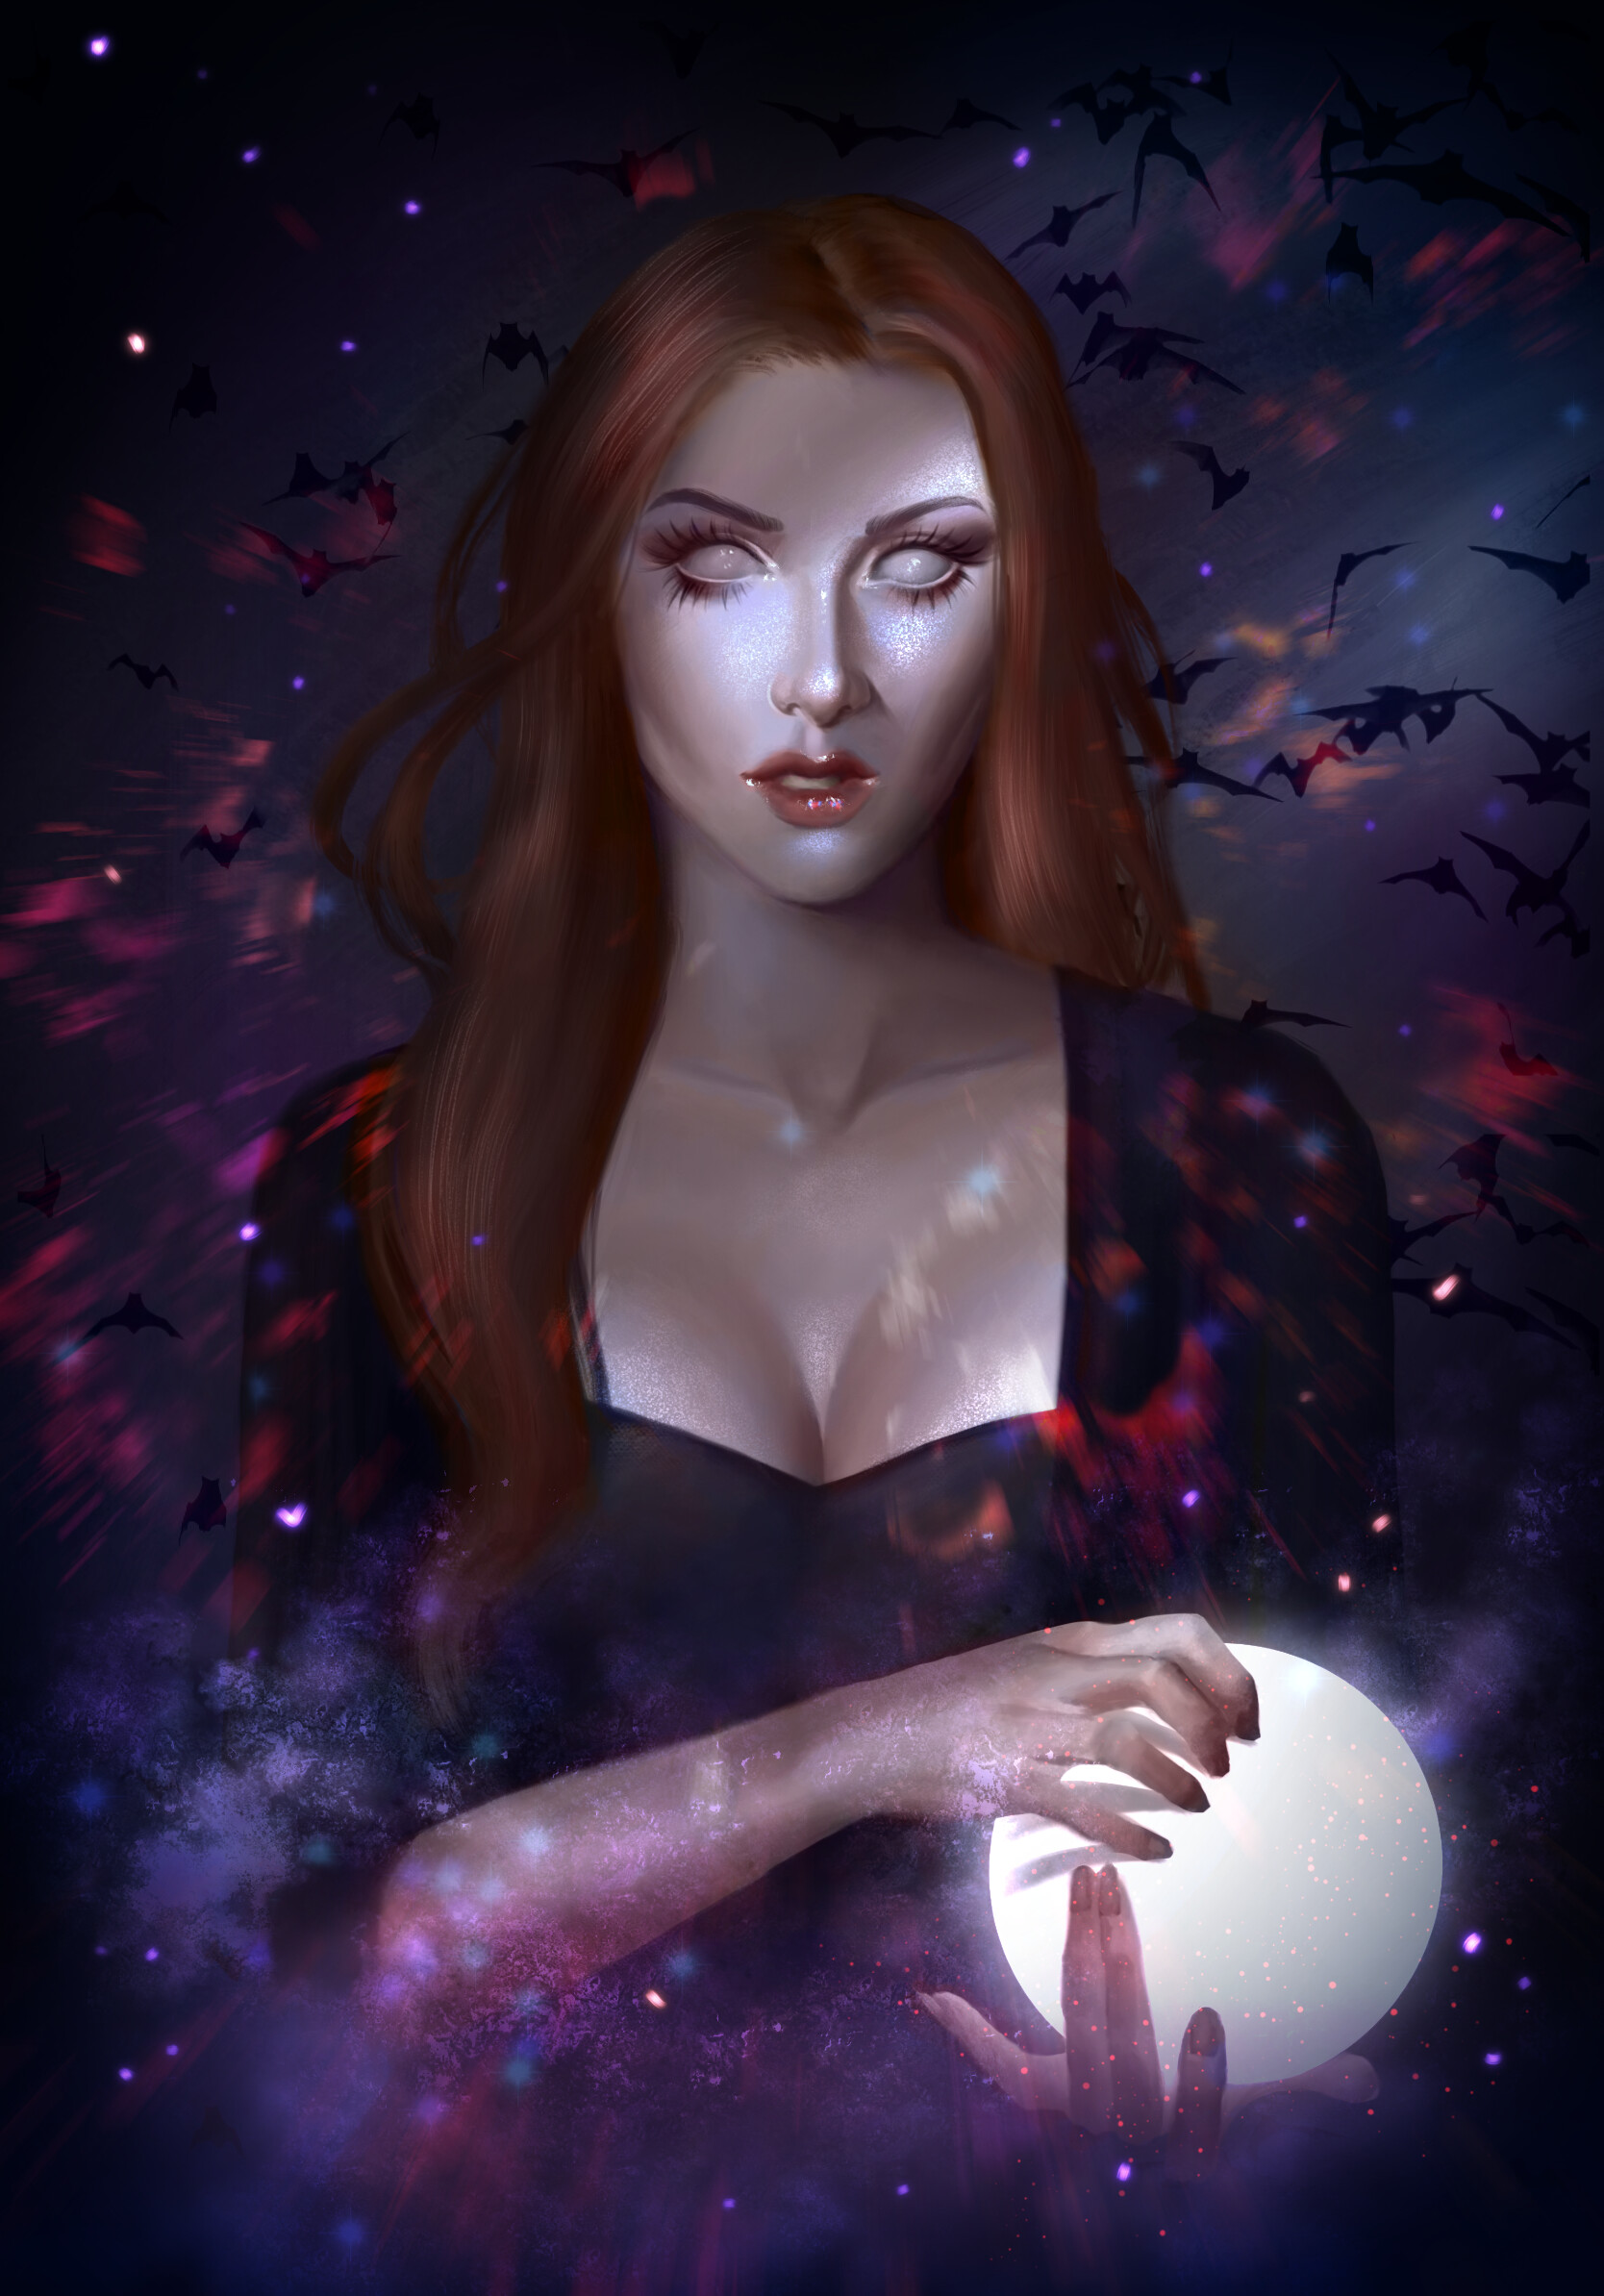 General 1668x2388 Emma Ronkainen artwork women witch white eyes portrait display redhead long hair cleavage bats digital painting digital art ArtStation open mouth